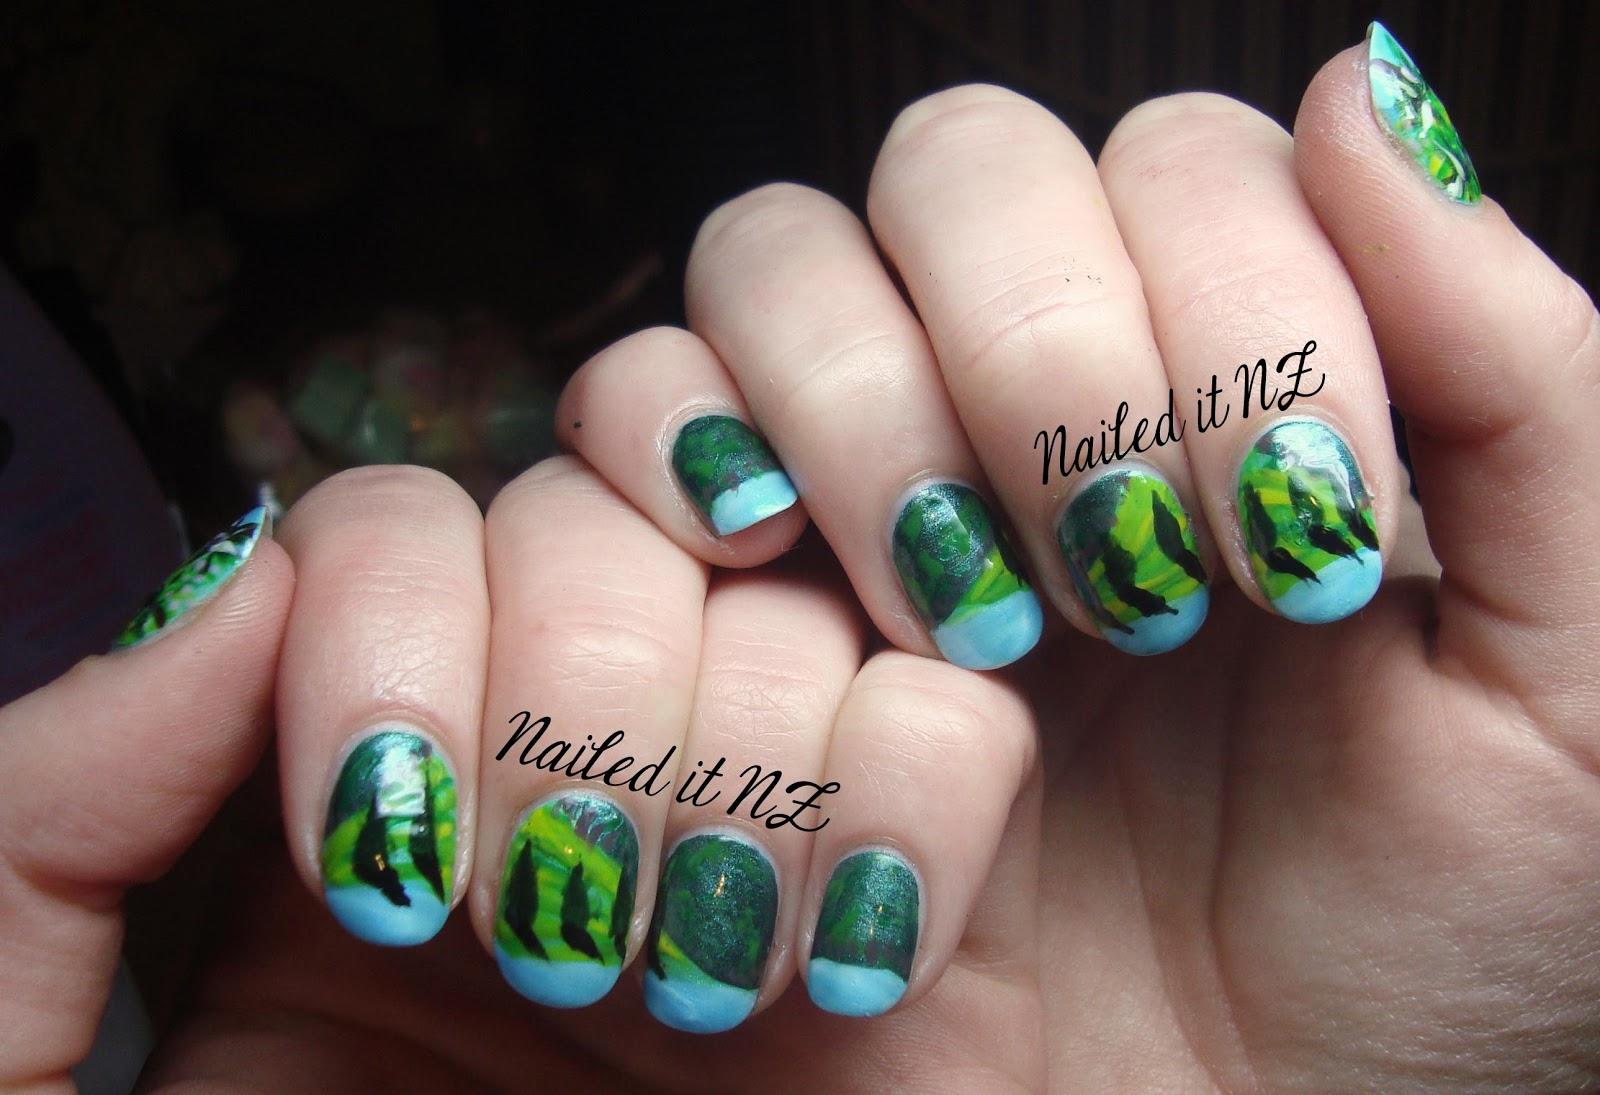 Landscape nail art - guest post on The Little Canvas